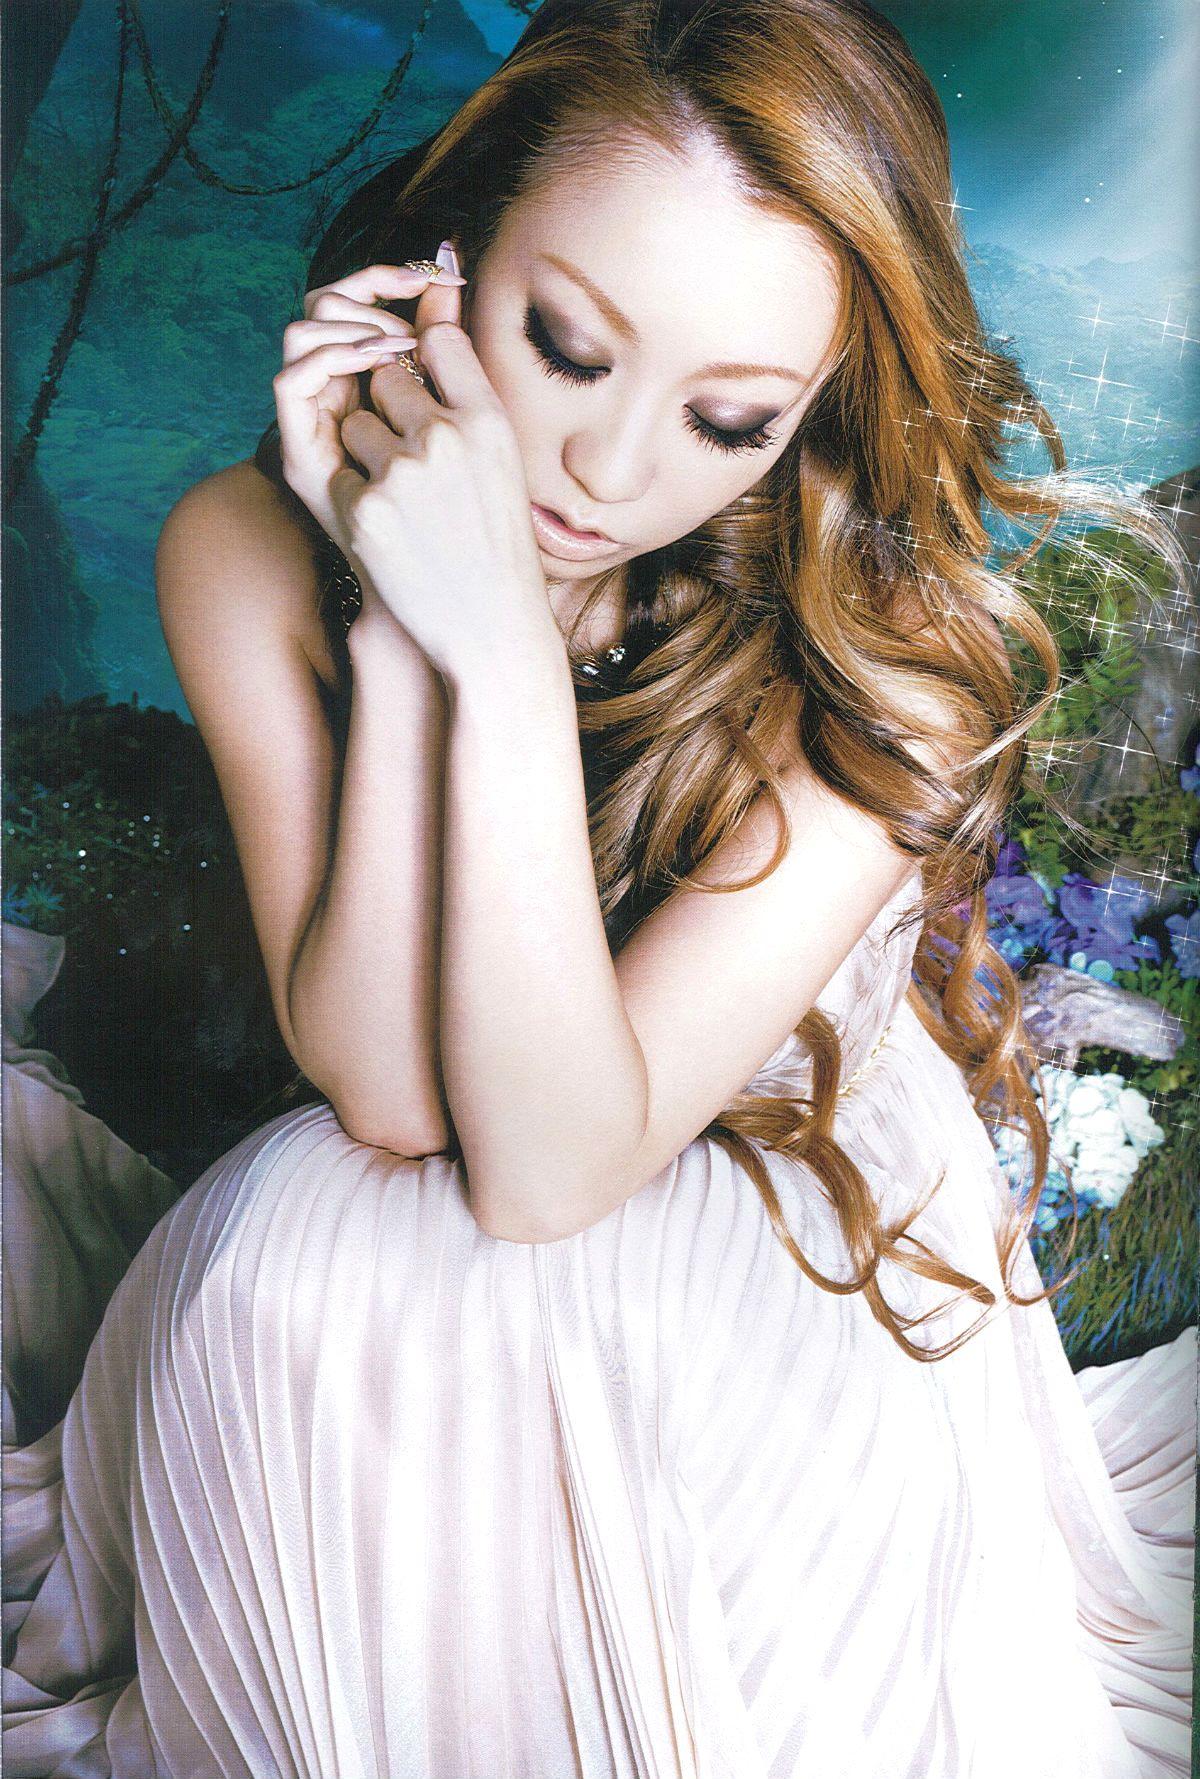 http://www.welcometokodakumiworld.com/gallery/scans/release/pamphlet/Pamphlet_-_Love_Romance/loveromance1.jpg